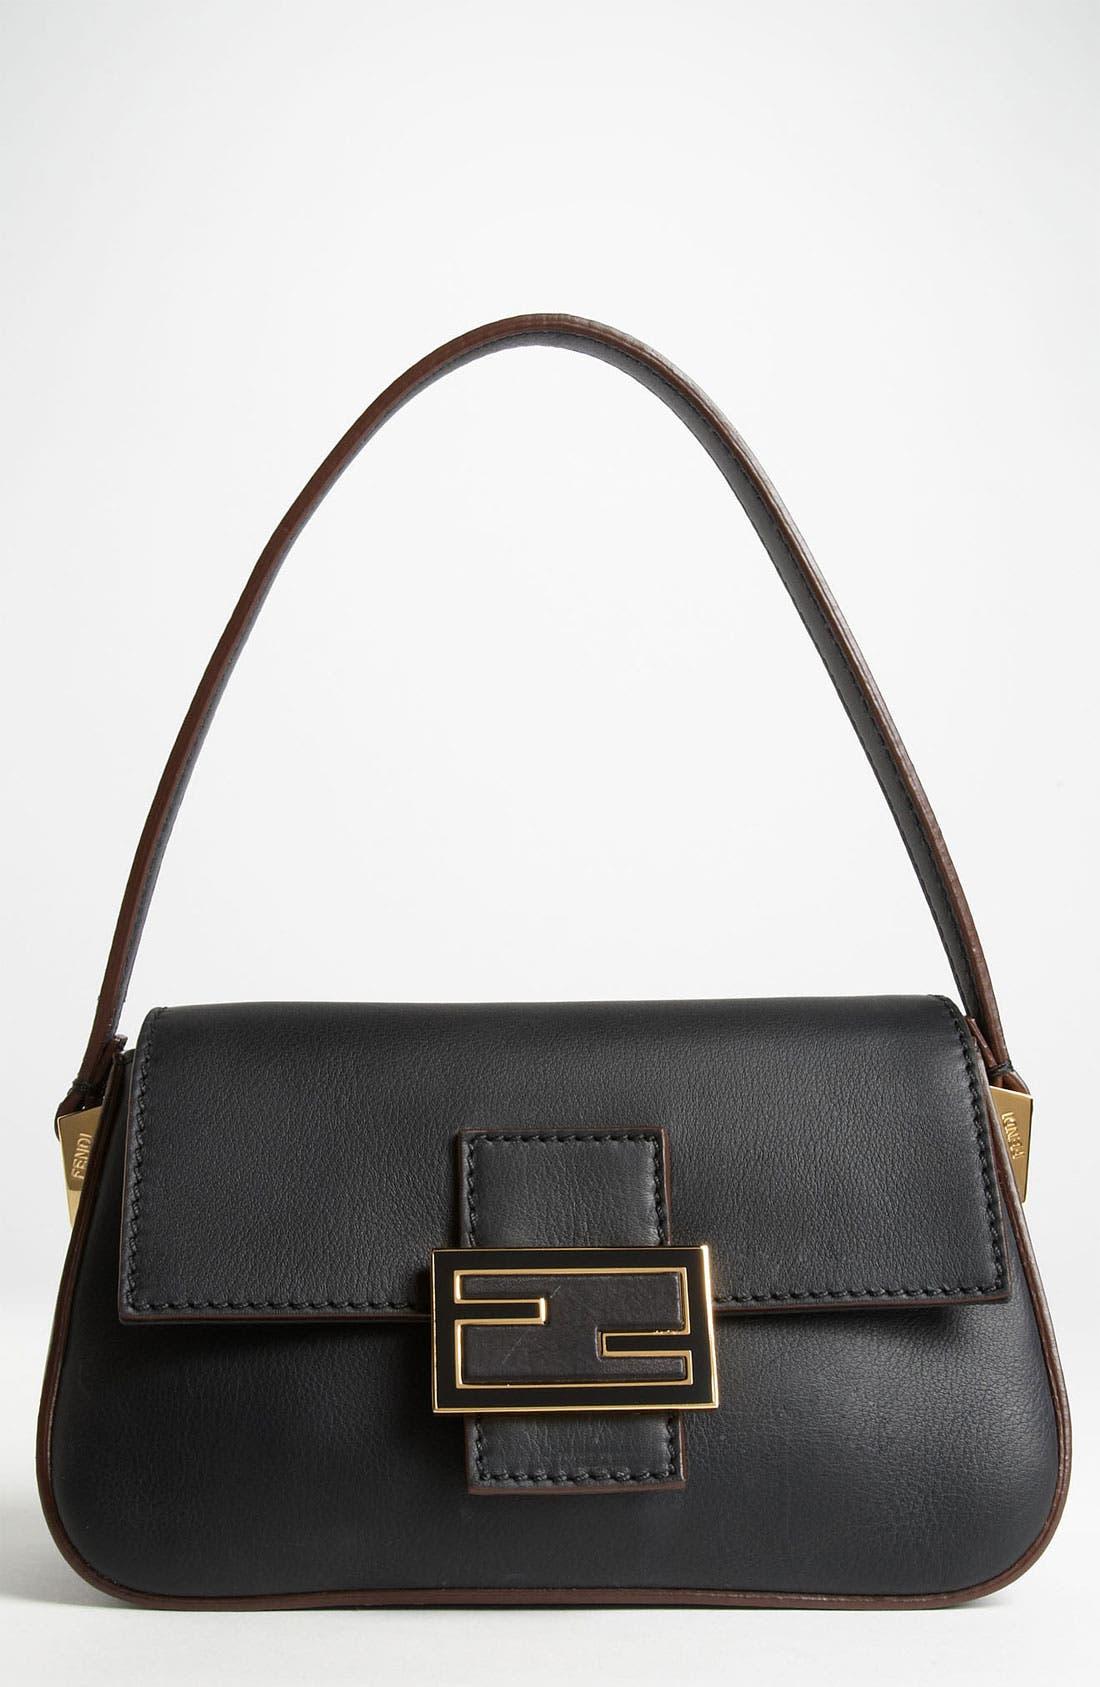 Alternate Image 1 Selected - Fendi 'Mamma - Mini' Leather Shoulder Bag